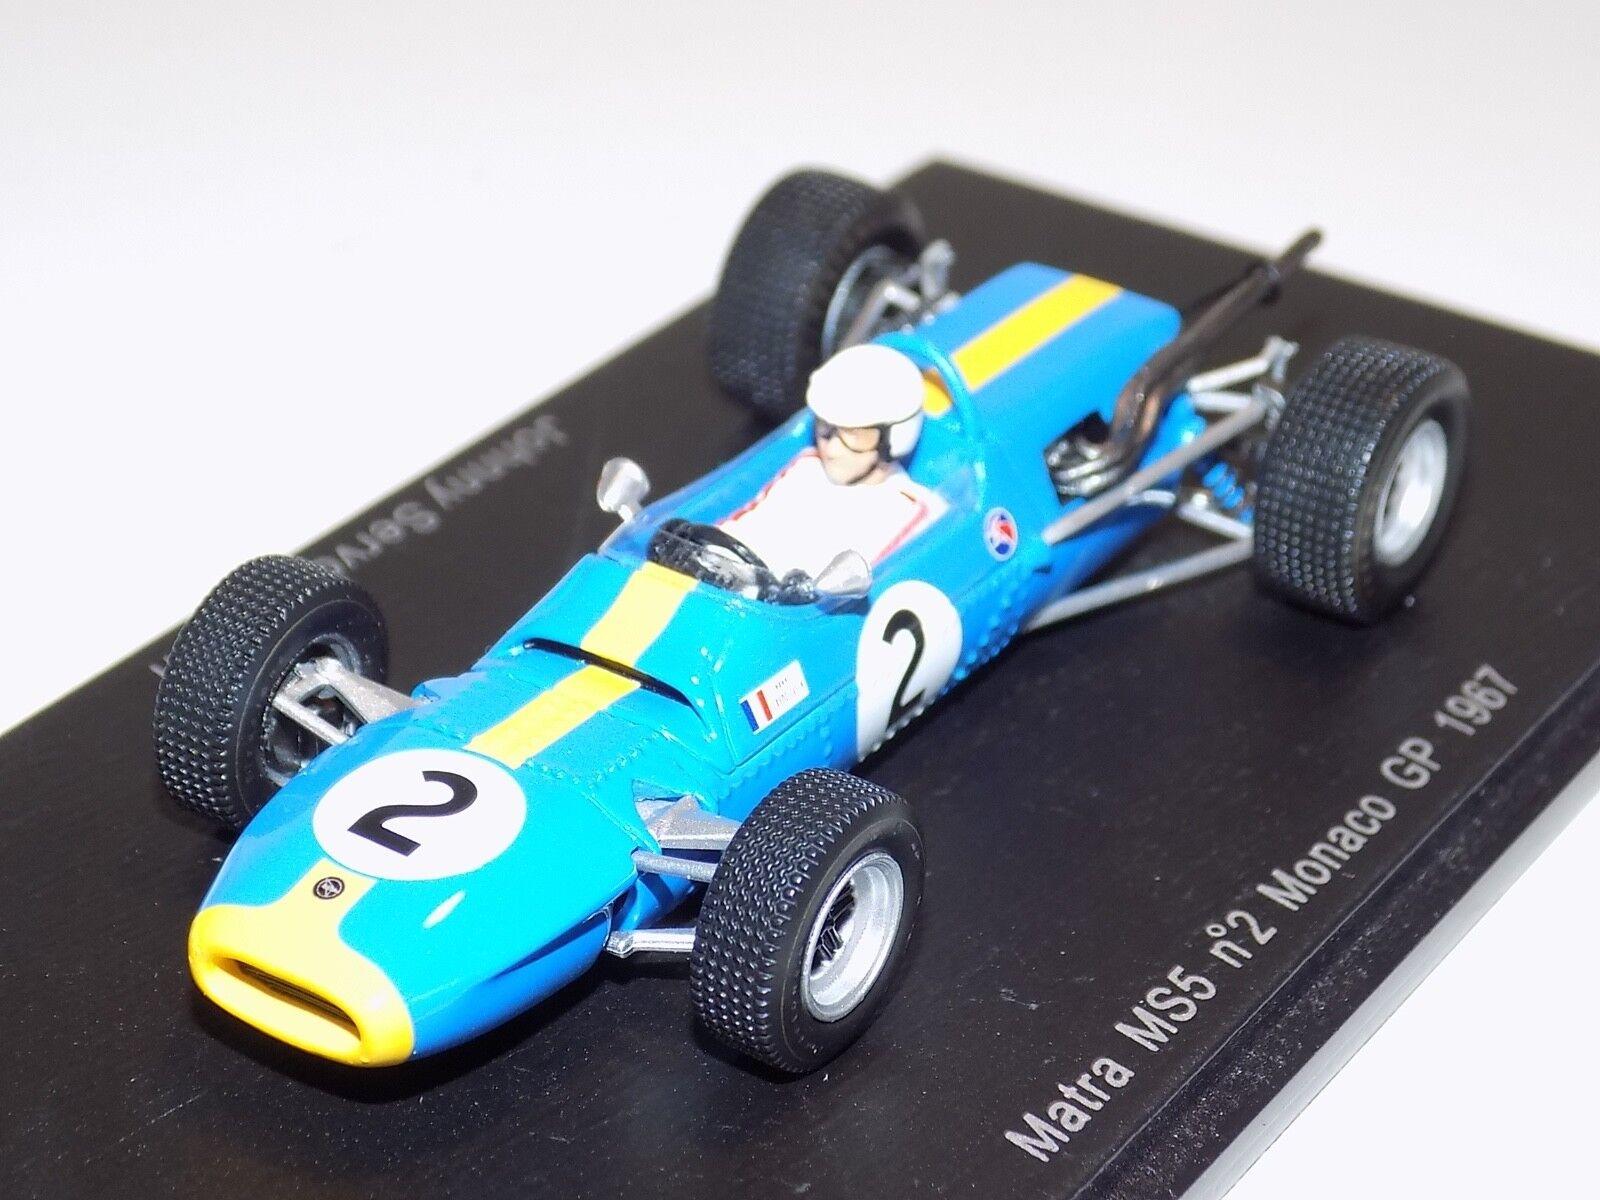 1 43 Spark F1 Formula 1 Matra MS5 car Monaco GP J.S.Gavin   S1595